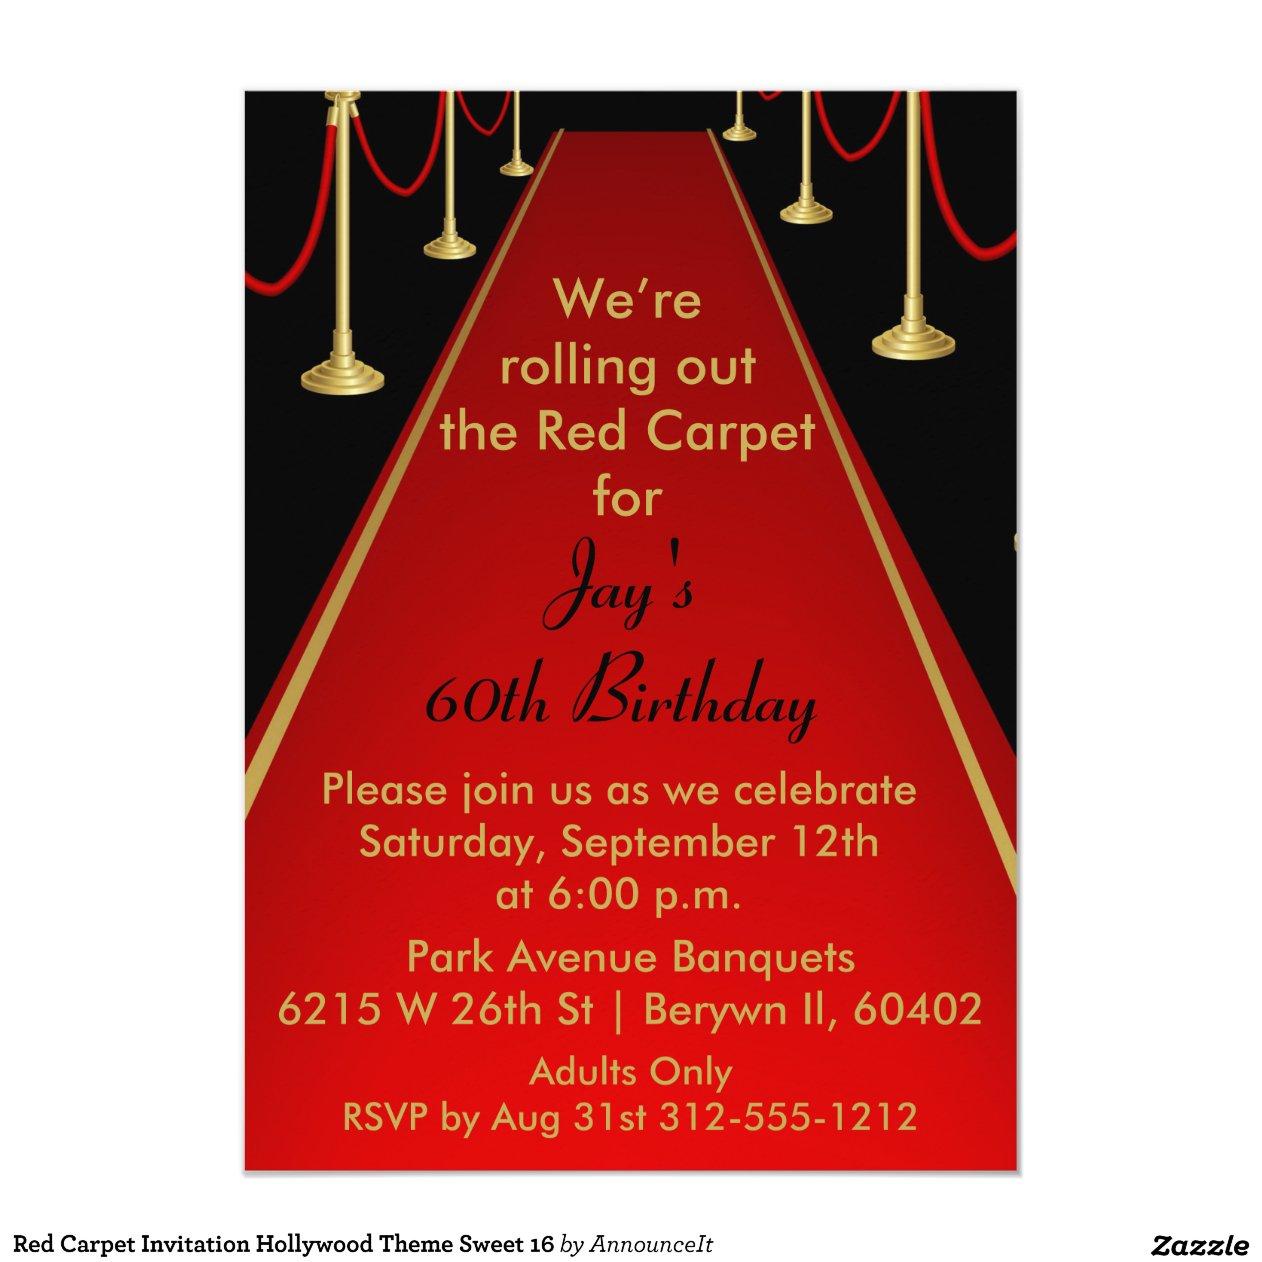 Red Carpet Invitation Hollywood Theme Sweet 16 Zazzle